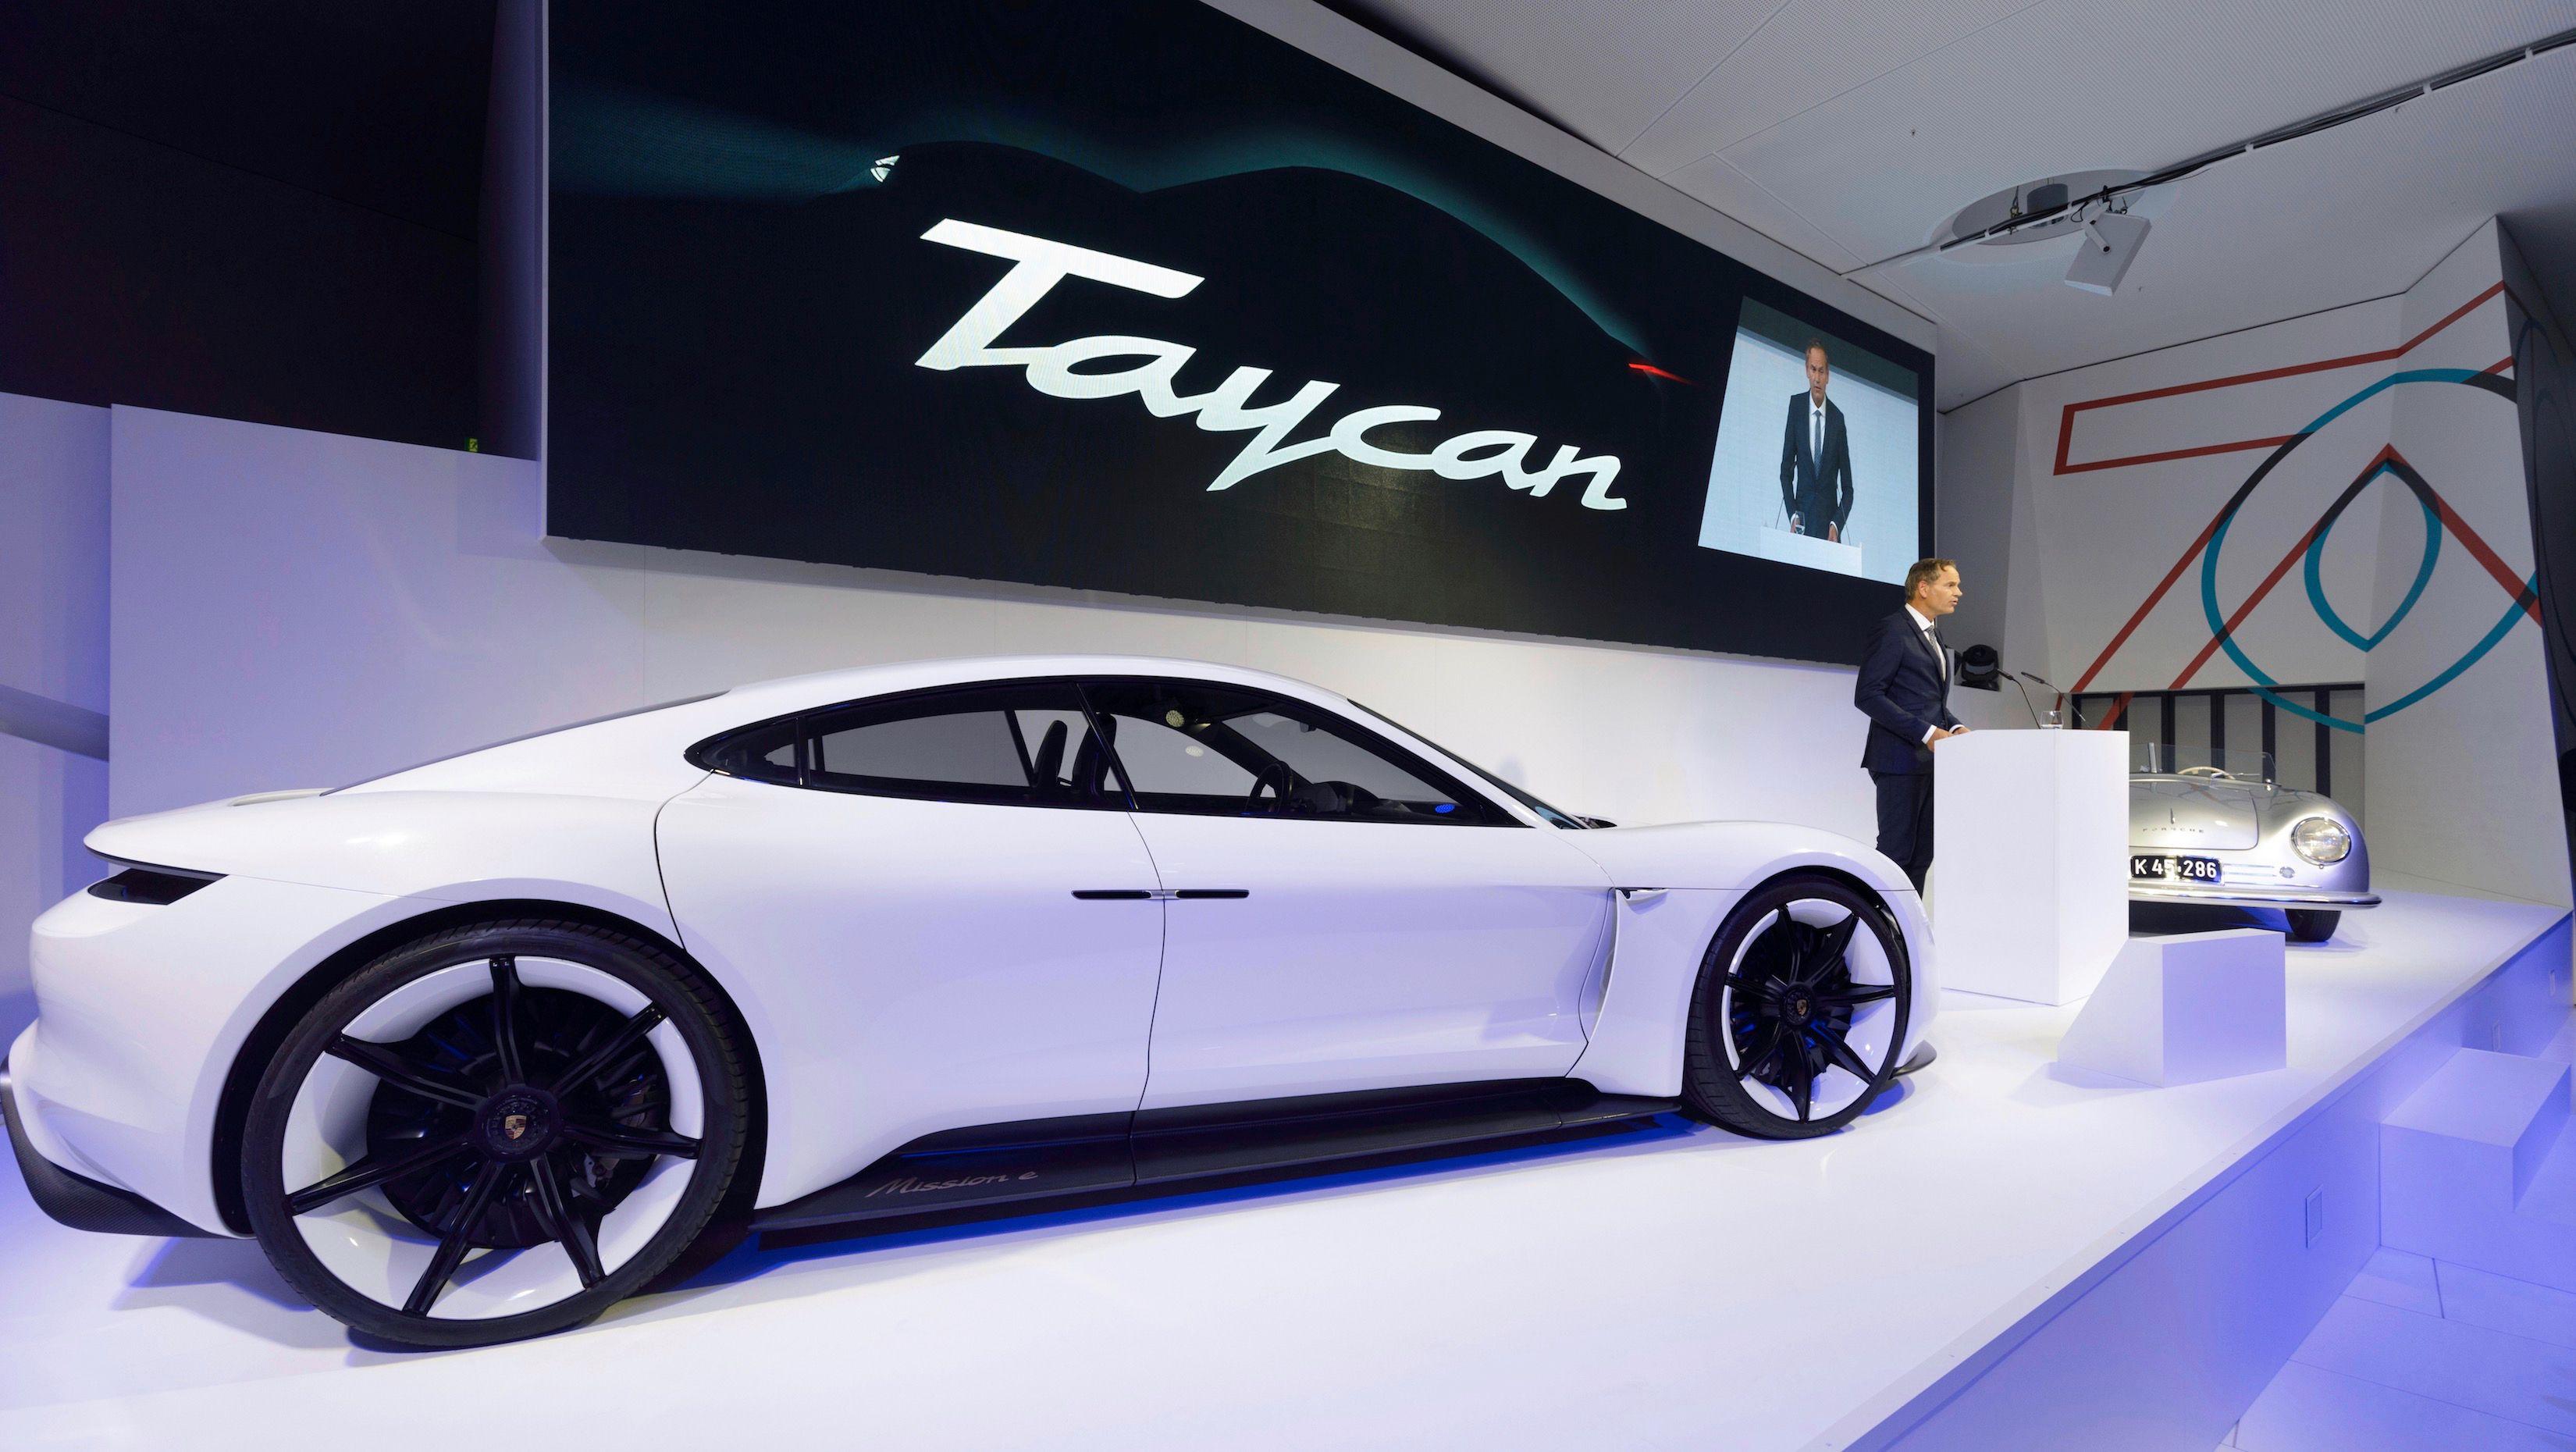 Porsche Taycan får 800 volt-system ombord, og støtte for svært rask hurtiglading.